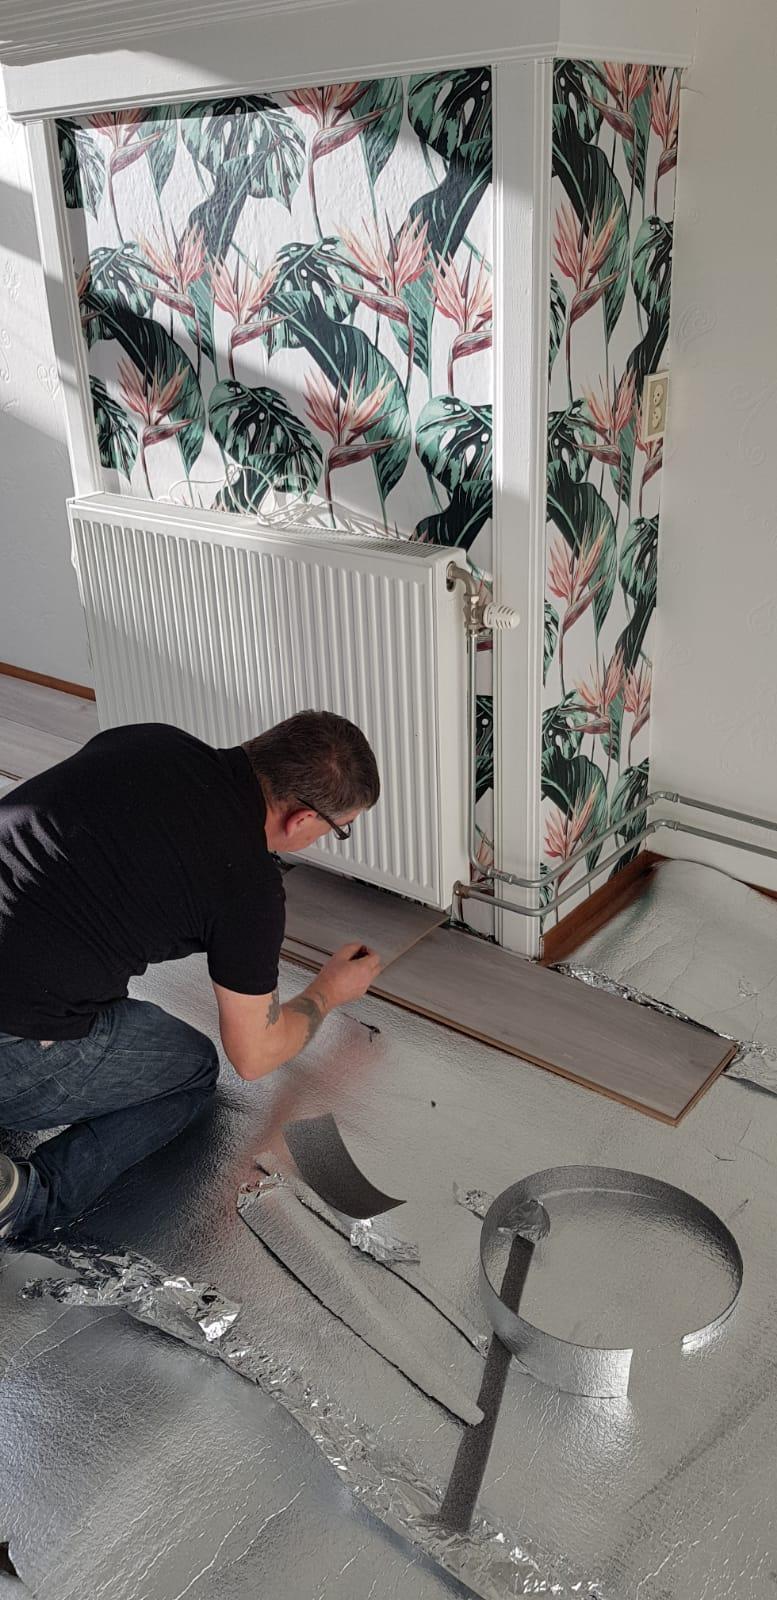 Vloer leggen, vloer montage, laminaat leggen en legservice. Alles in eigen huis. Eigen monteur.